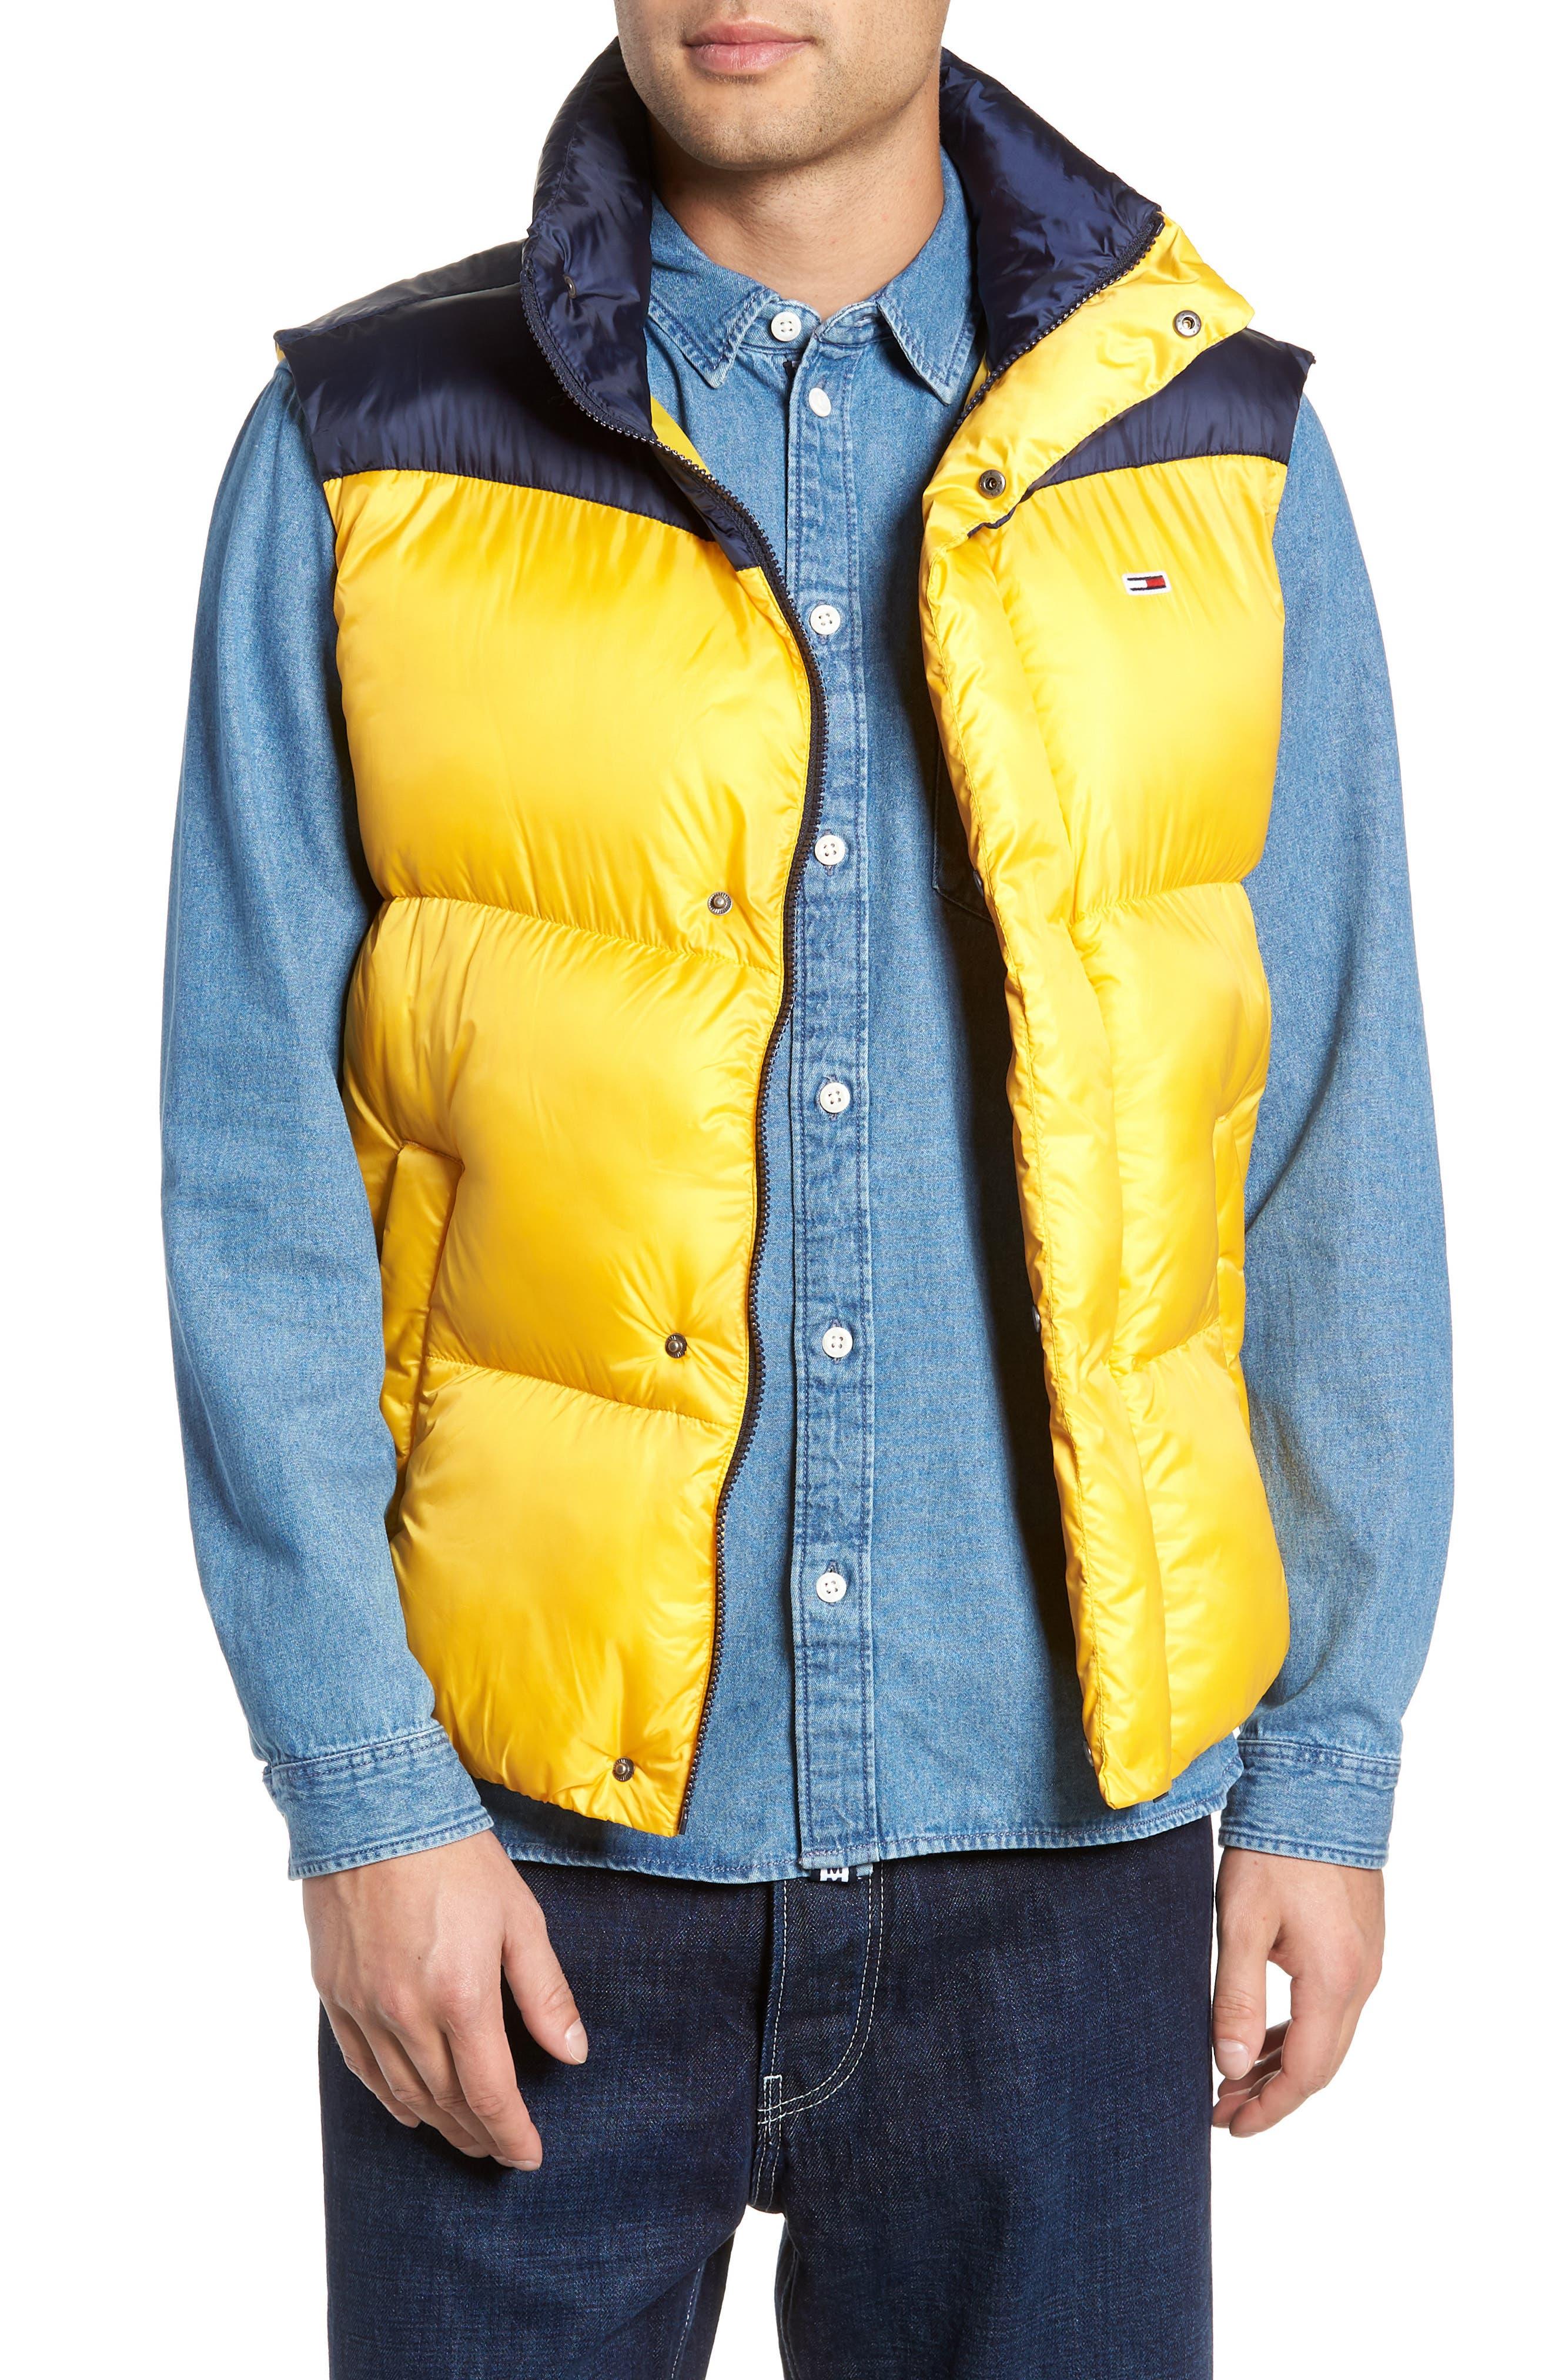 TJM Tommy Classics Vest,                         Main,                         color, SPECTRA YELLOW / BLACK IRIS